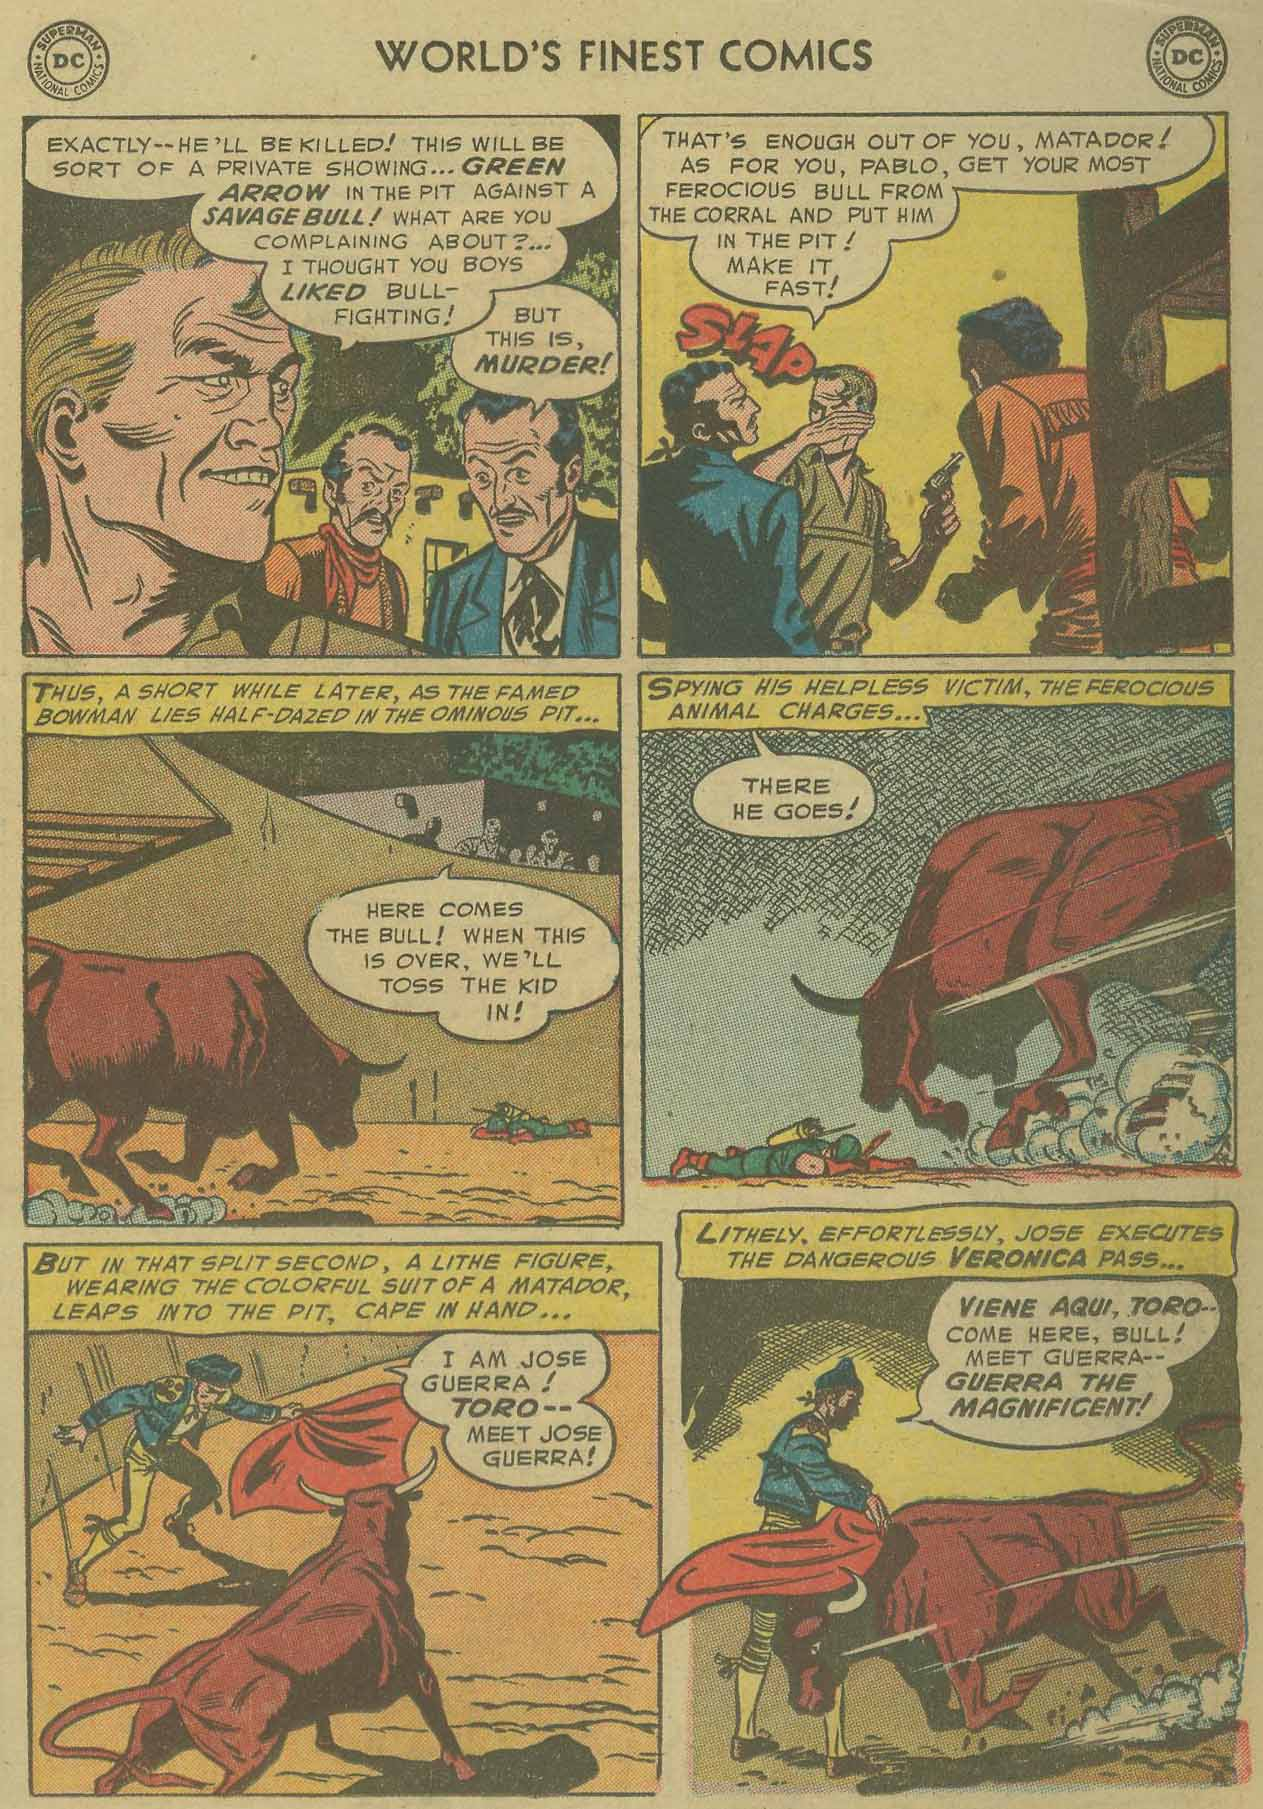 Read online World's Finest Comics comic -  Issue #69 - 35